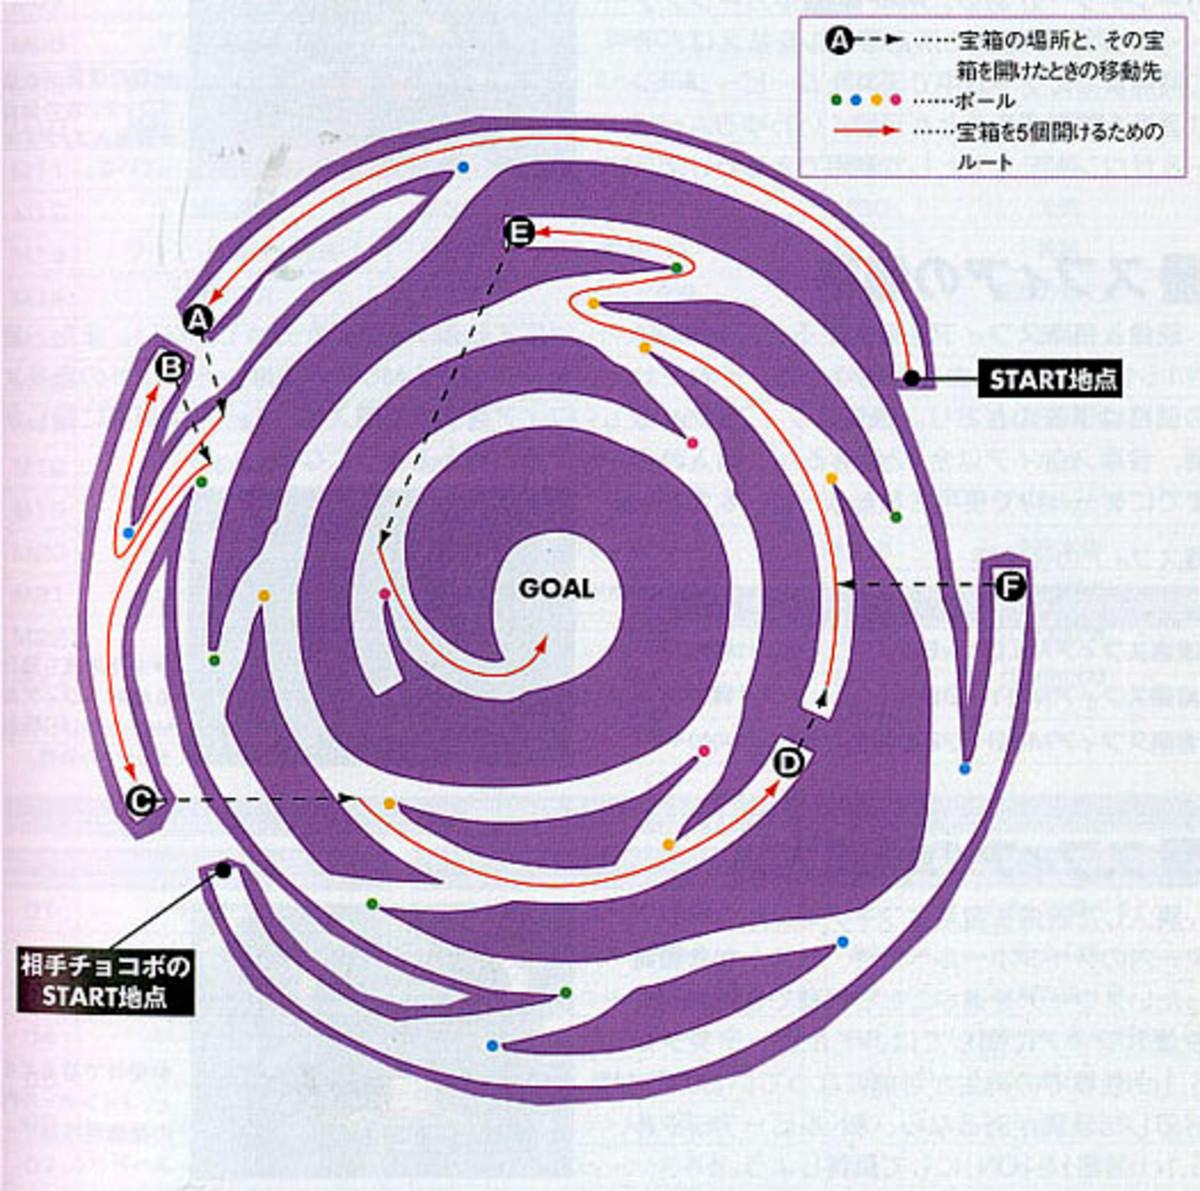 Remiem Temple - Chocobo Race Track